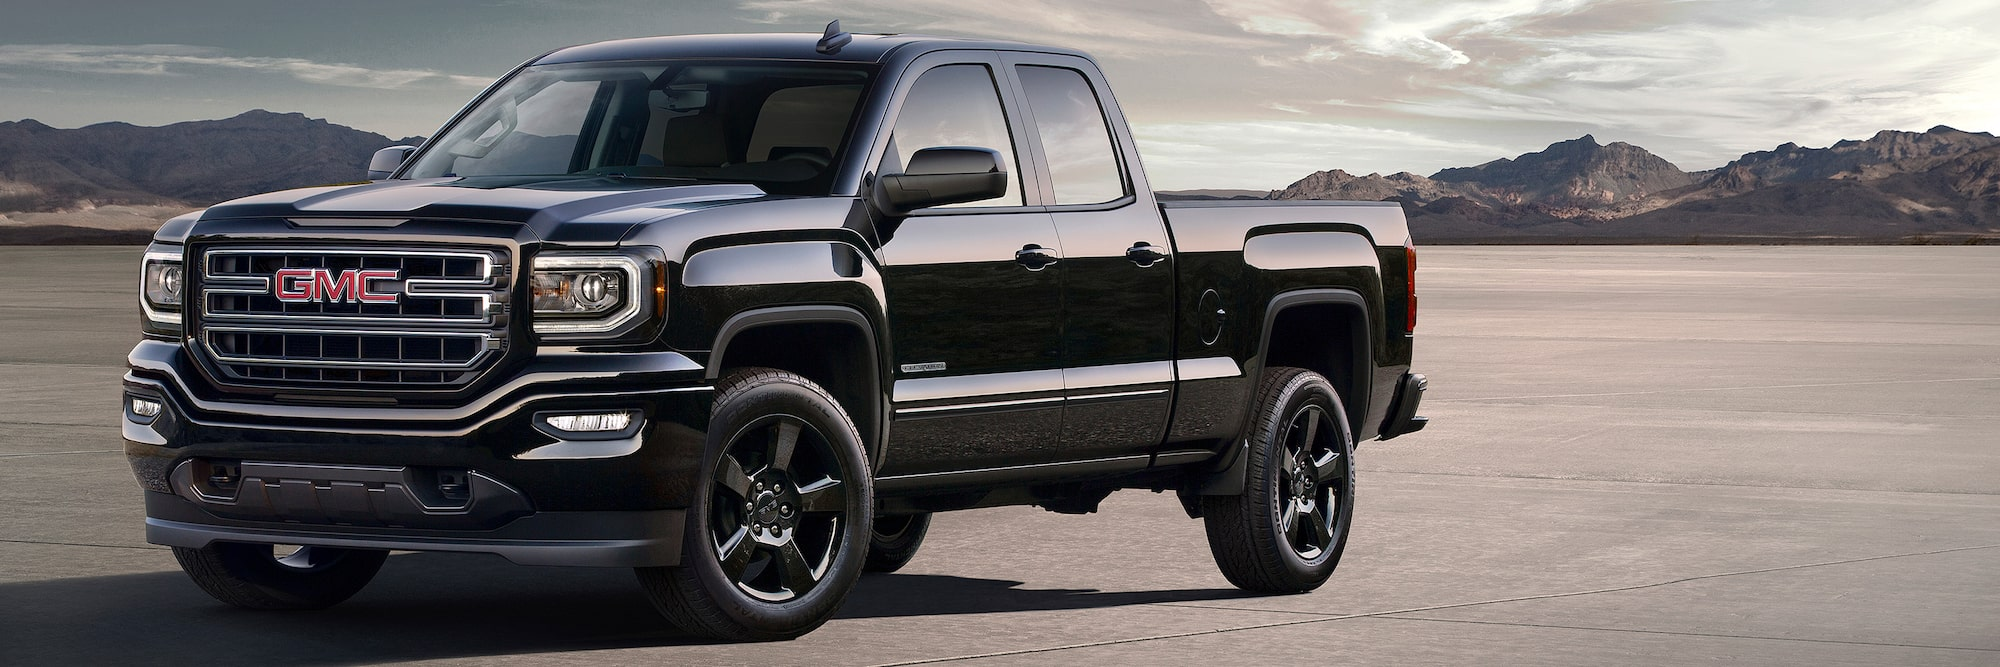 Gmc truck models